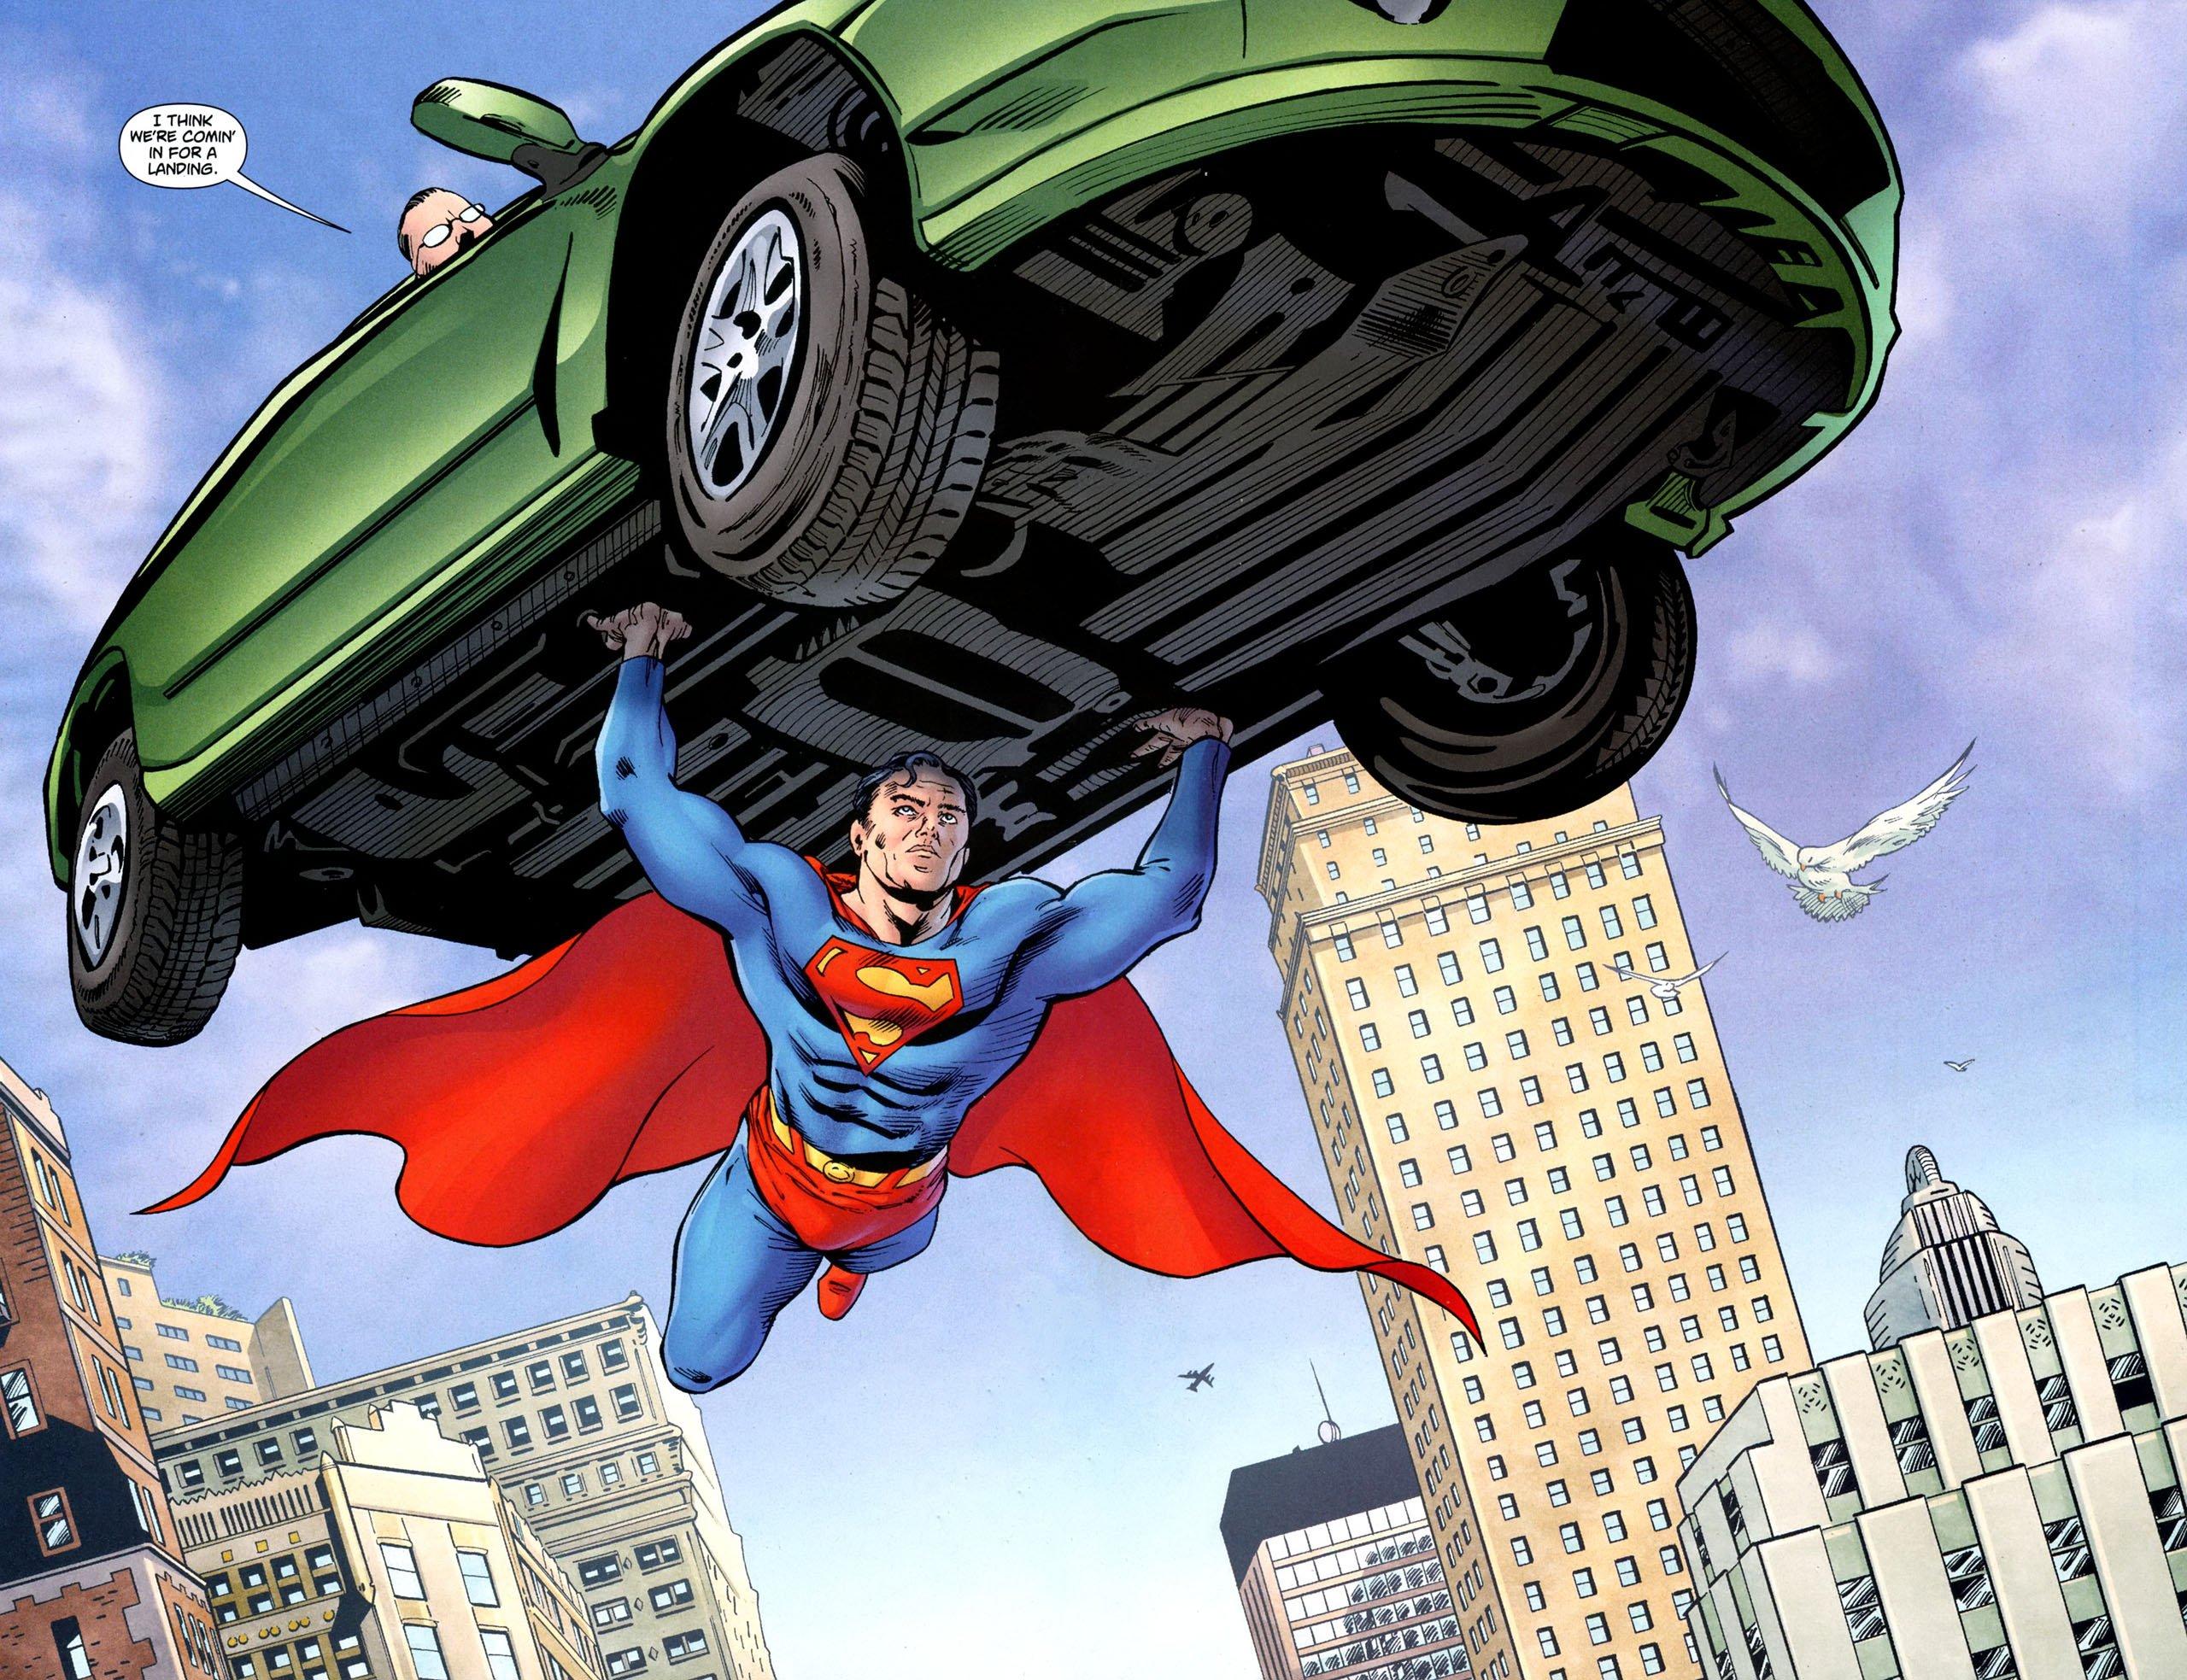 NFI Corp_superman-lifts-a-car_industrial strength_blog